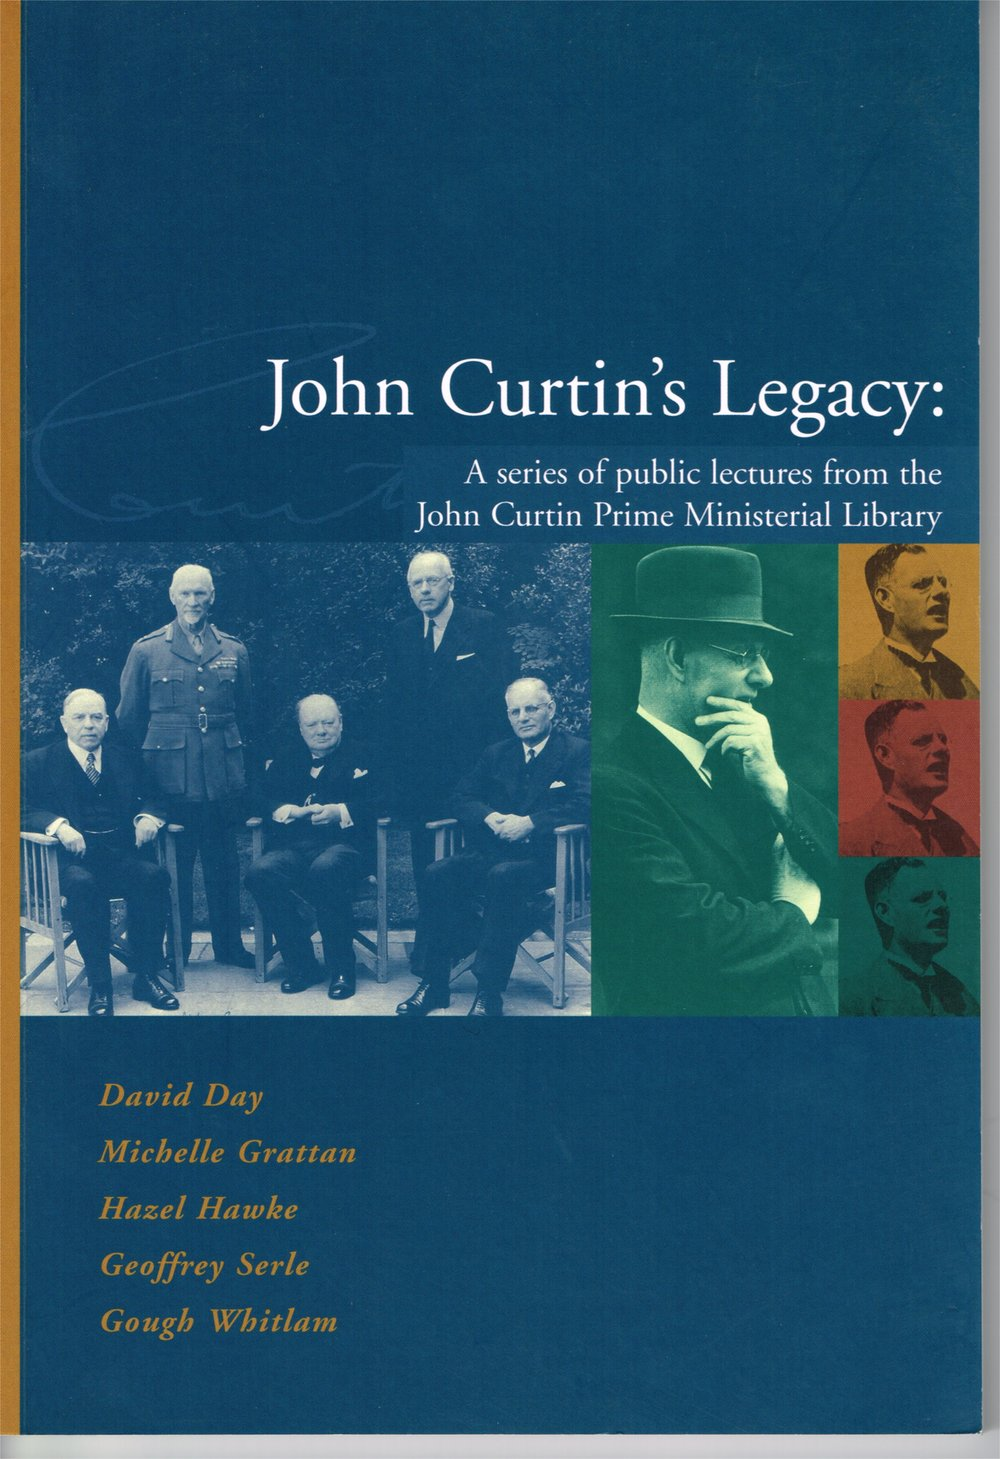 John Curtin's Legacy (2000).jpg